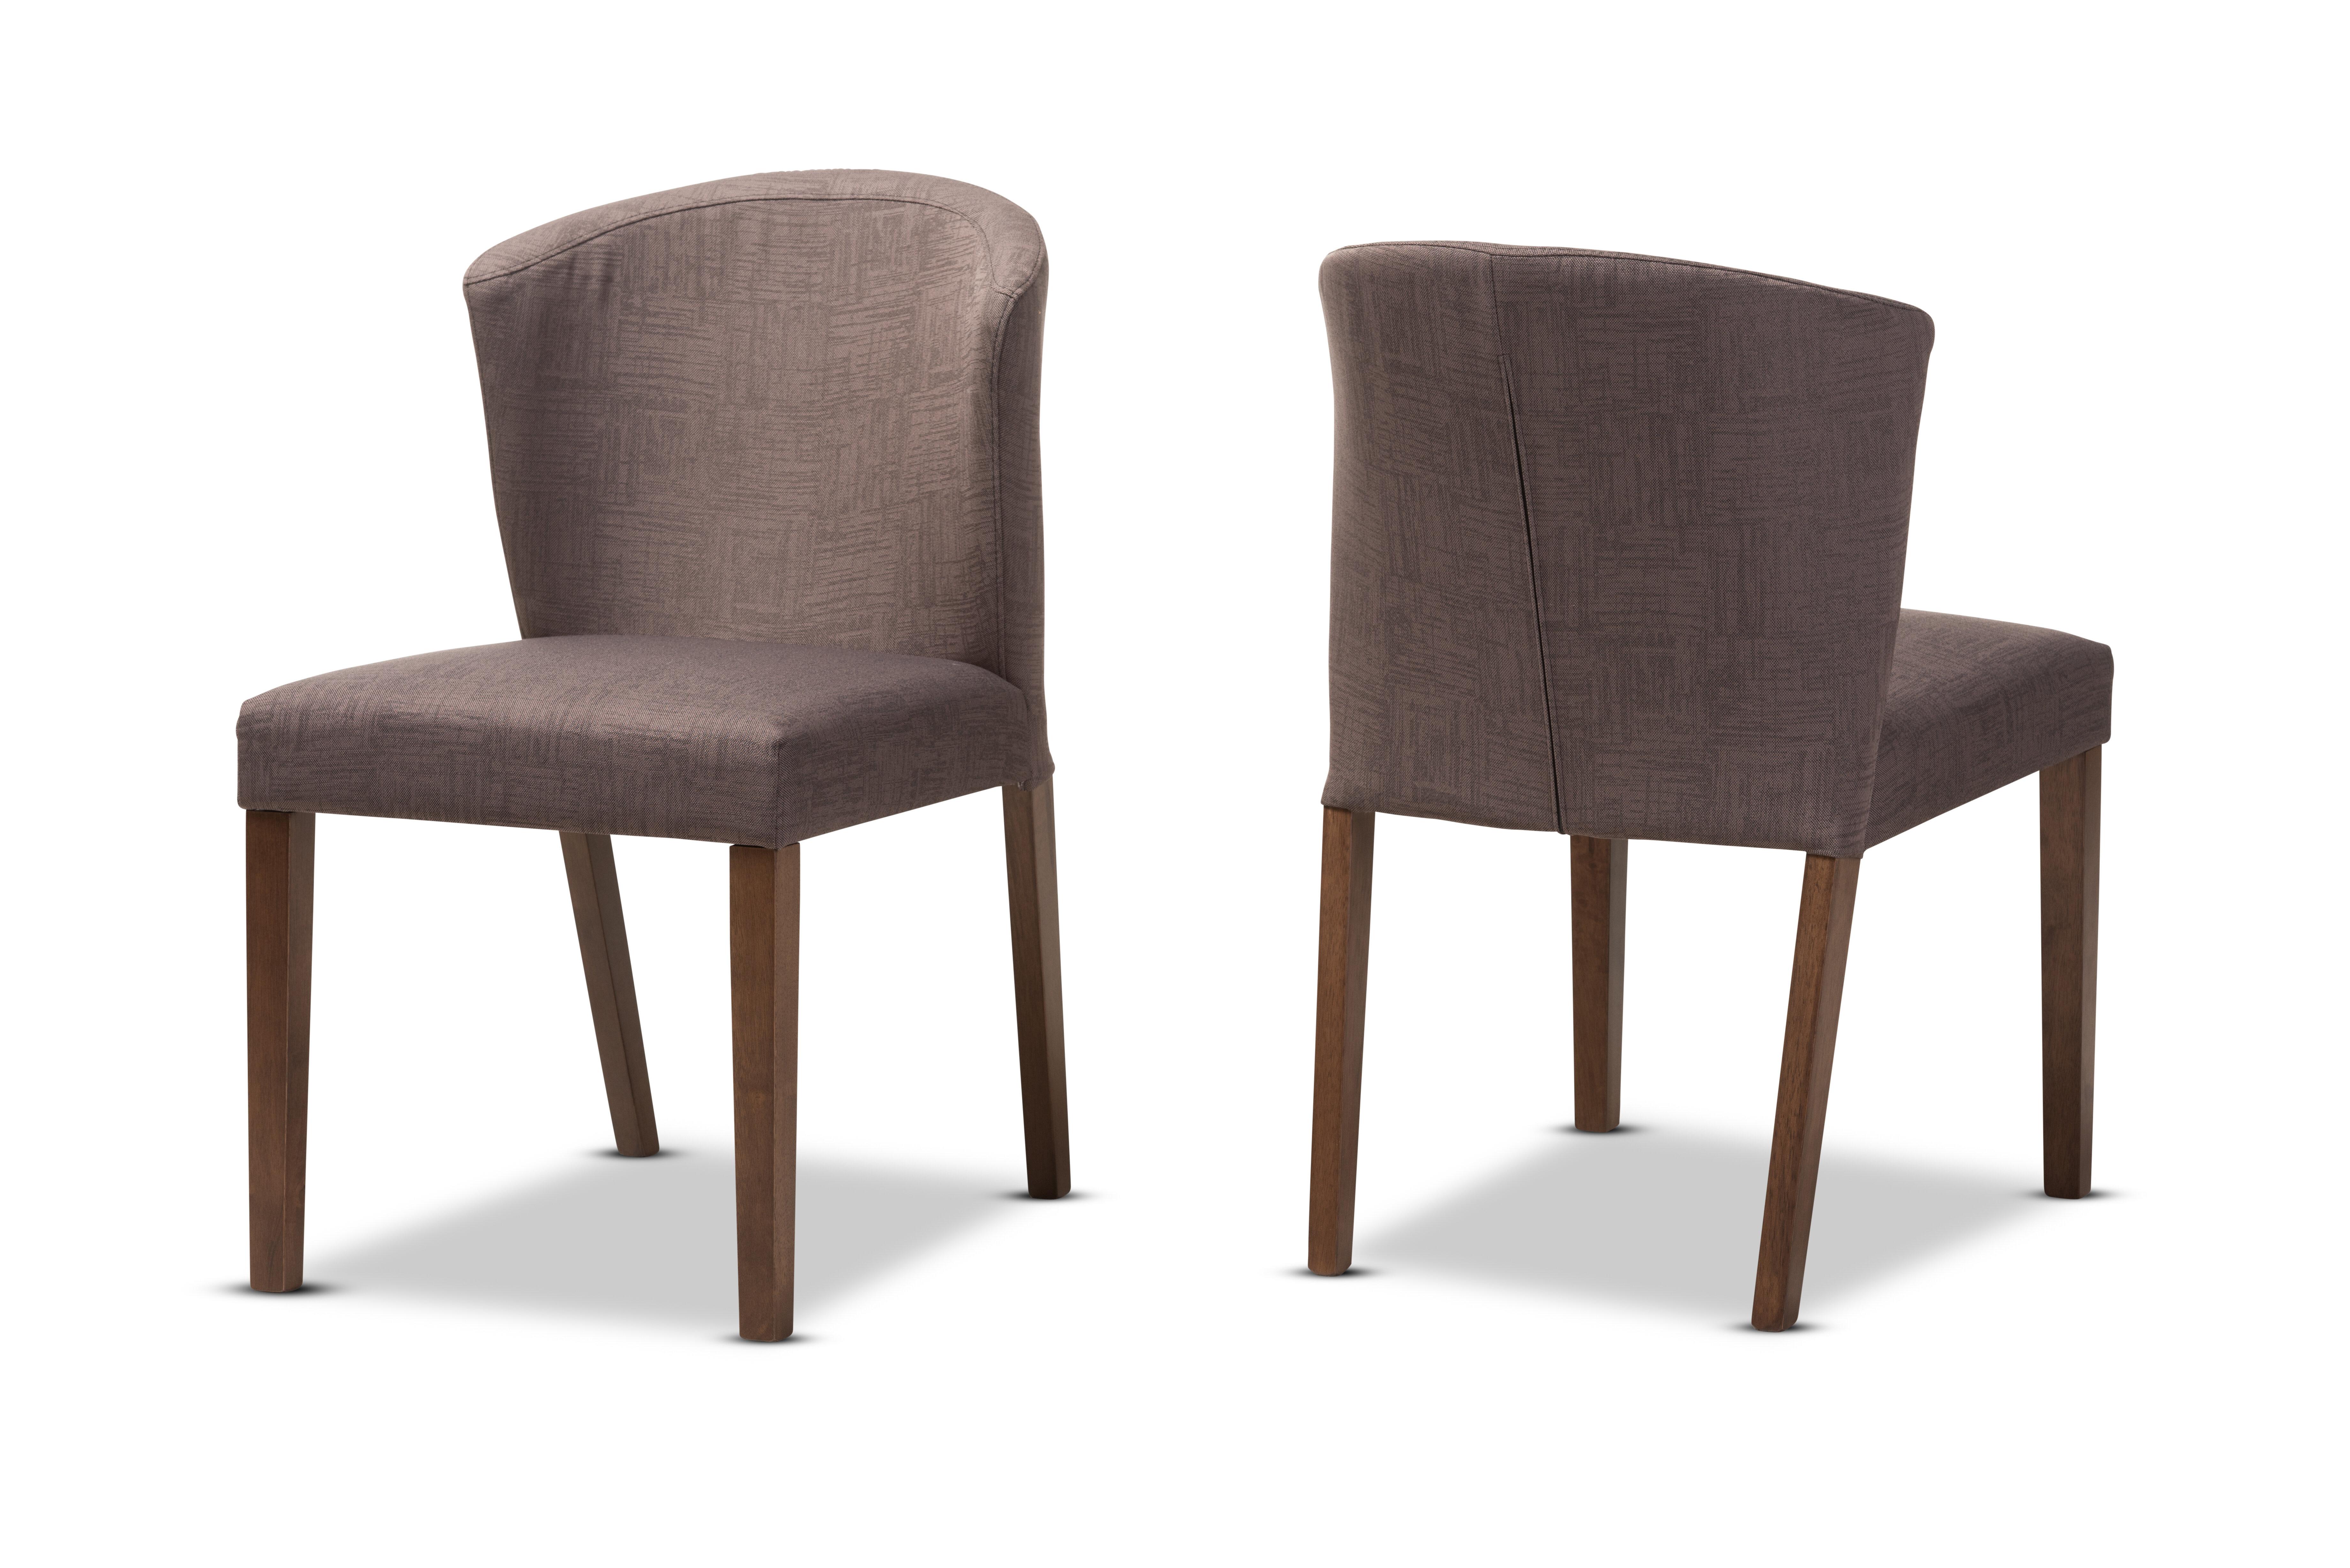 Brayden studio stalnaker mid century modern upholstered dining chair wayfair